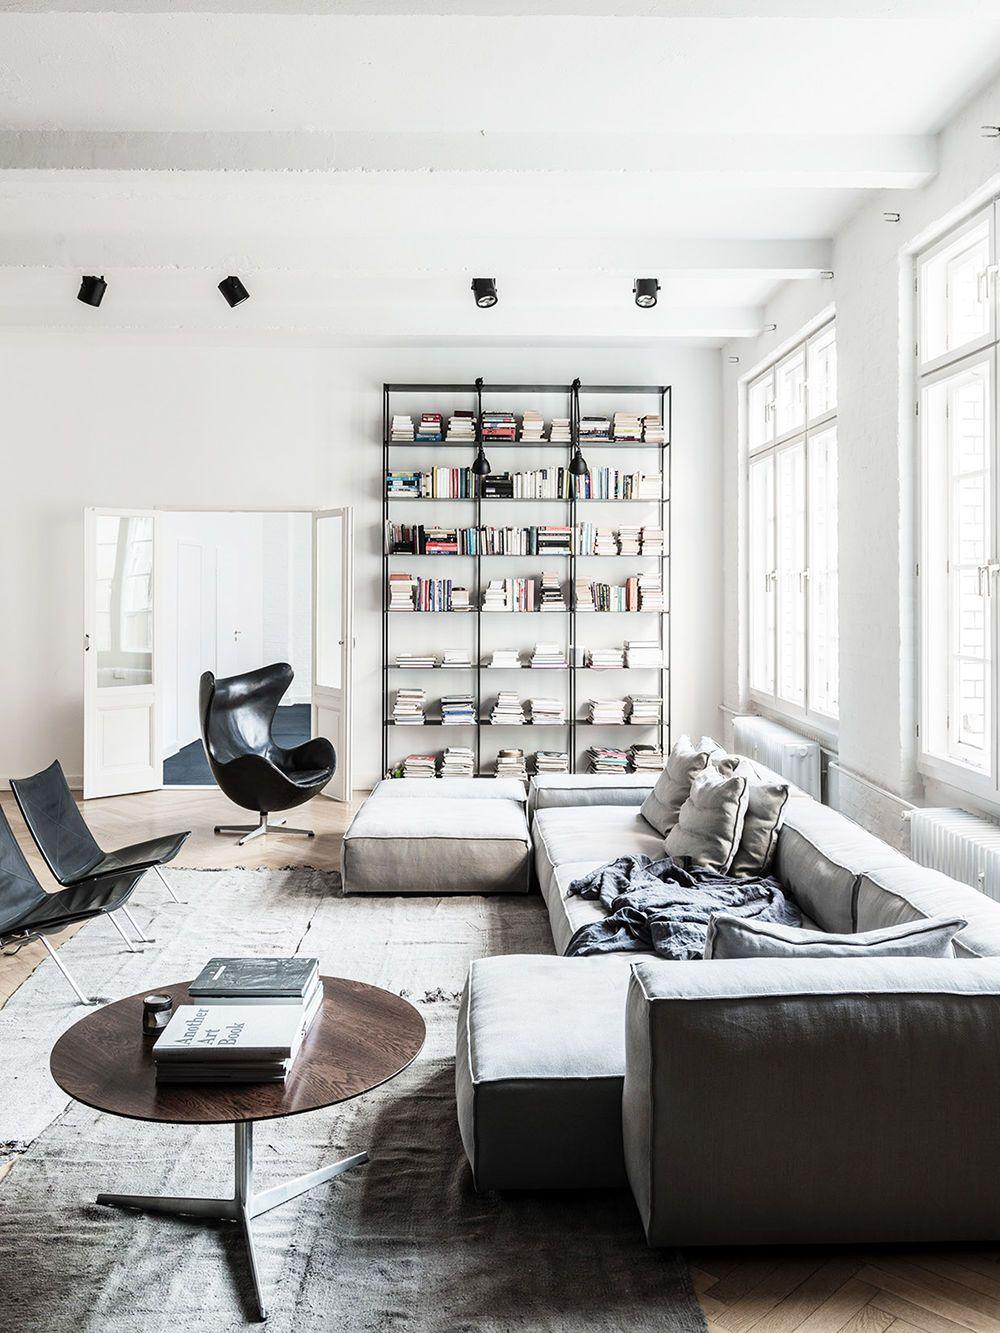 Minimal Interior Design Inspiration #56